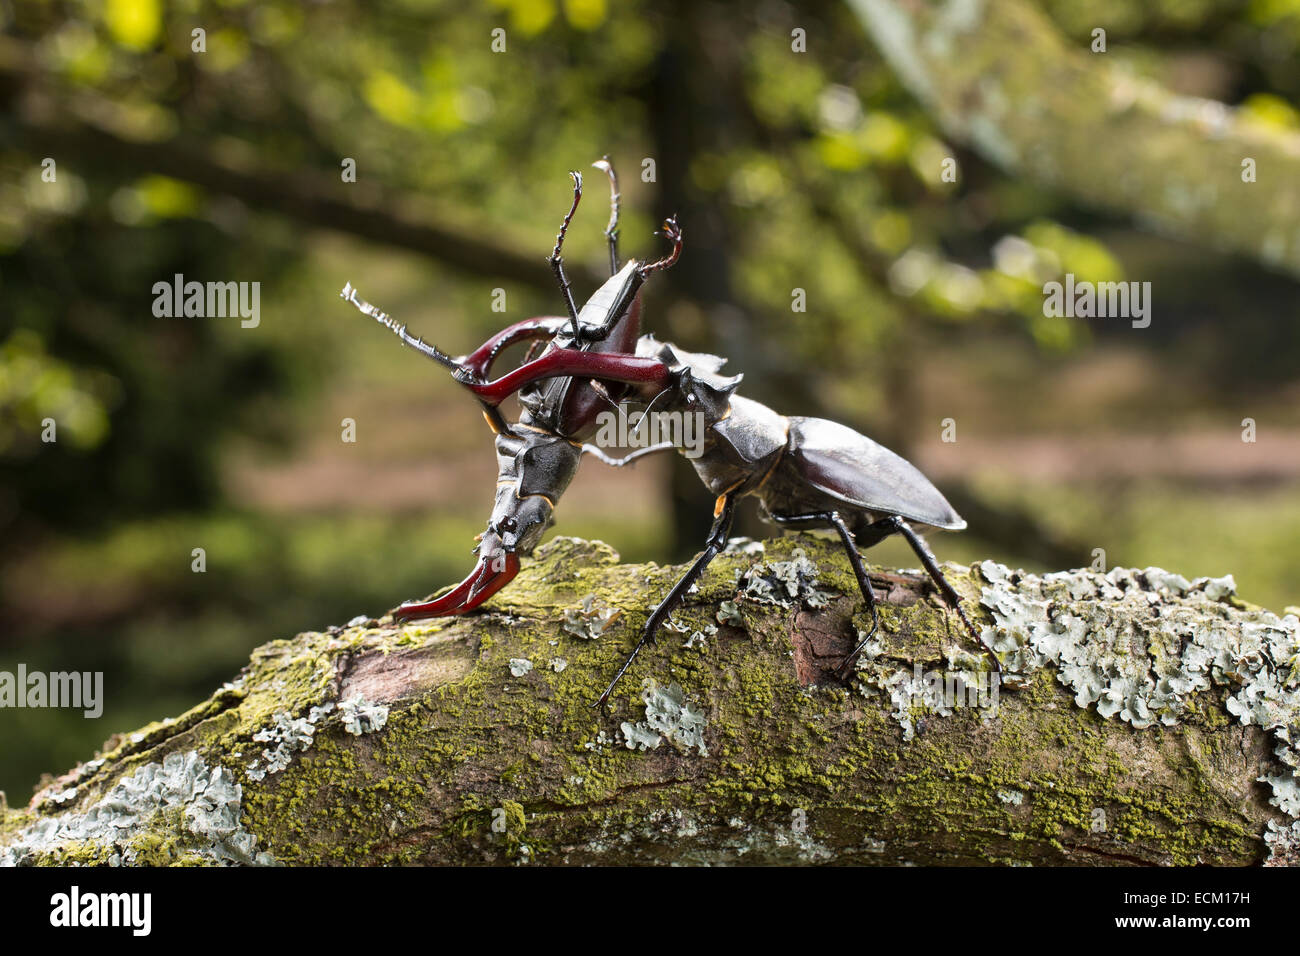 European stag beetle, stag-beetle, male, fighting, fight, duel, Hirschkäfer, Männchen, Kampf, kämpfend, - Stock Image